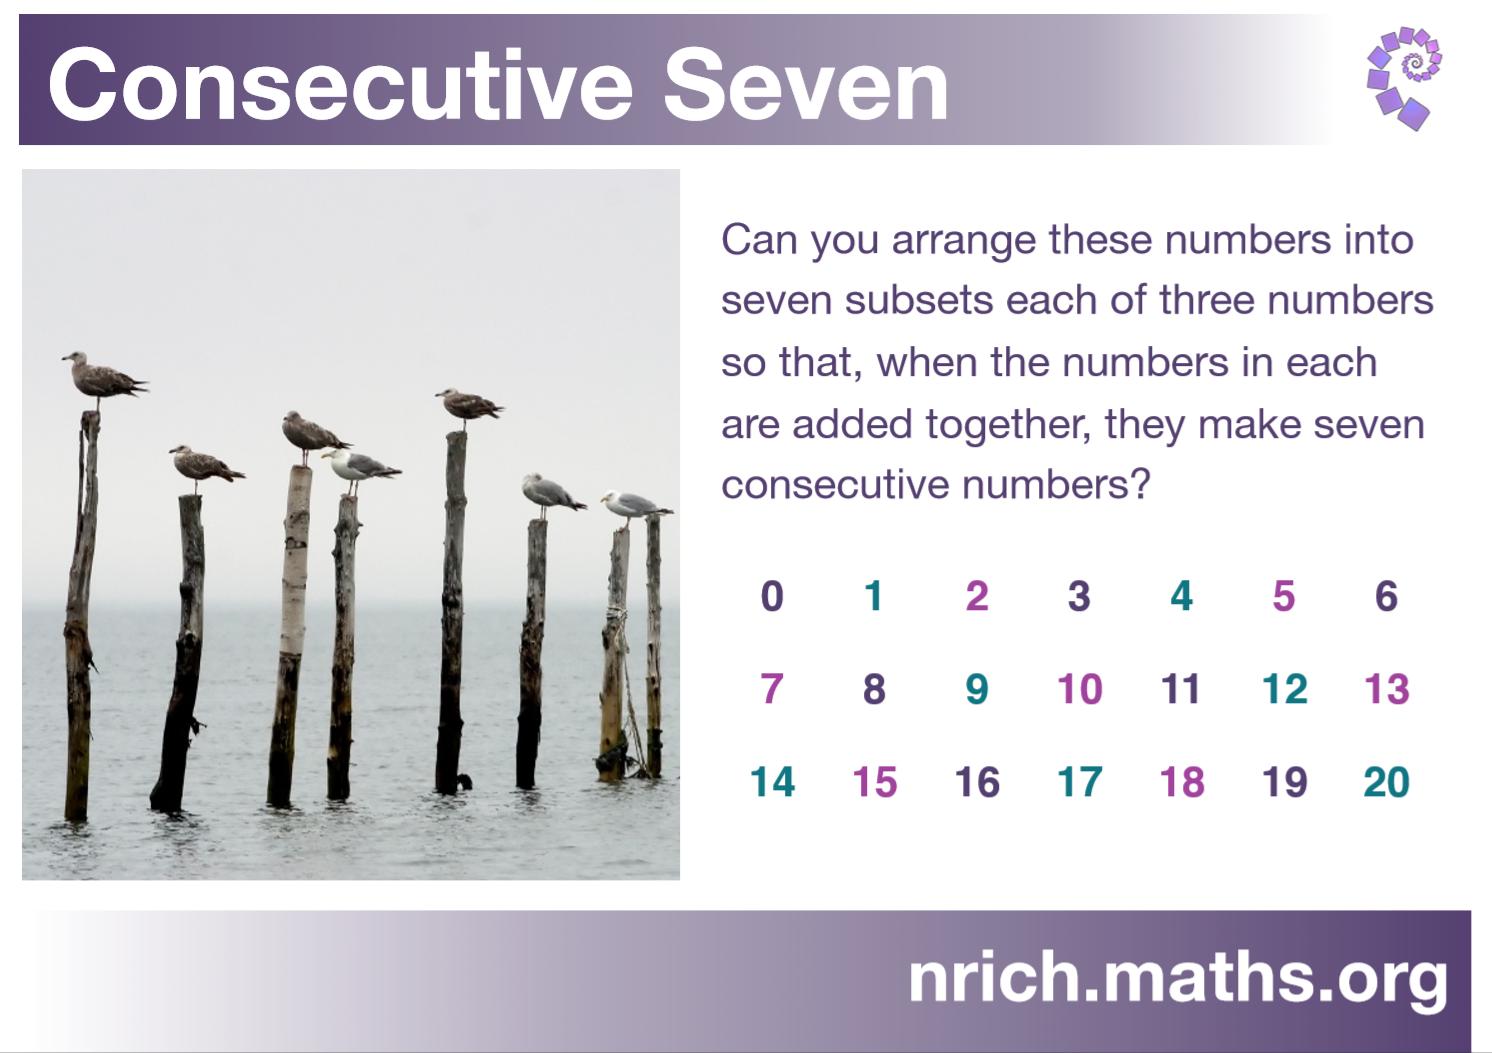 Consecutive Seven Poster : nrich.maths.org